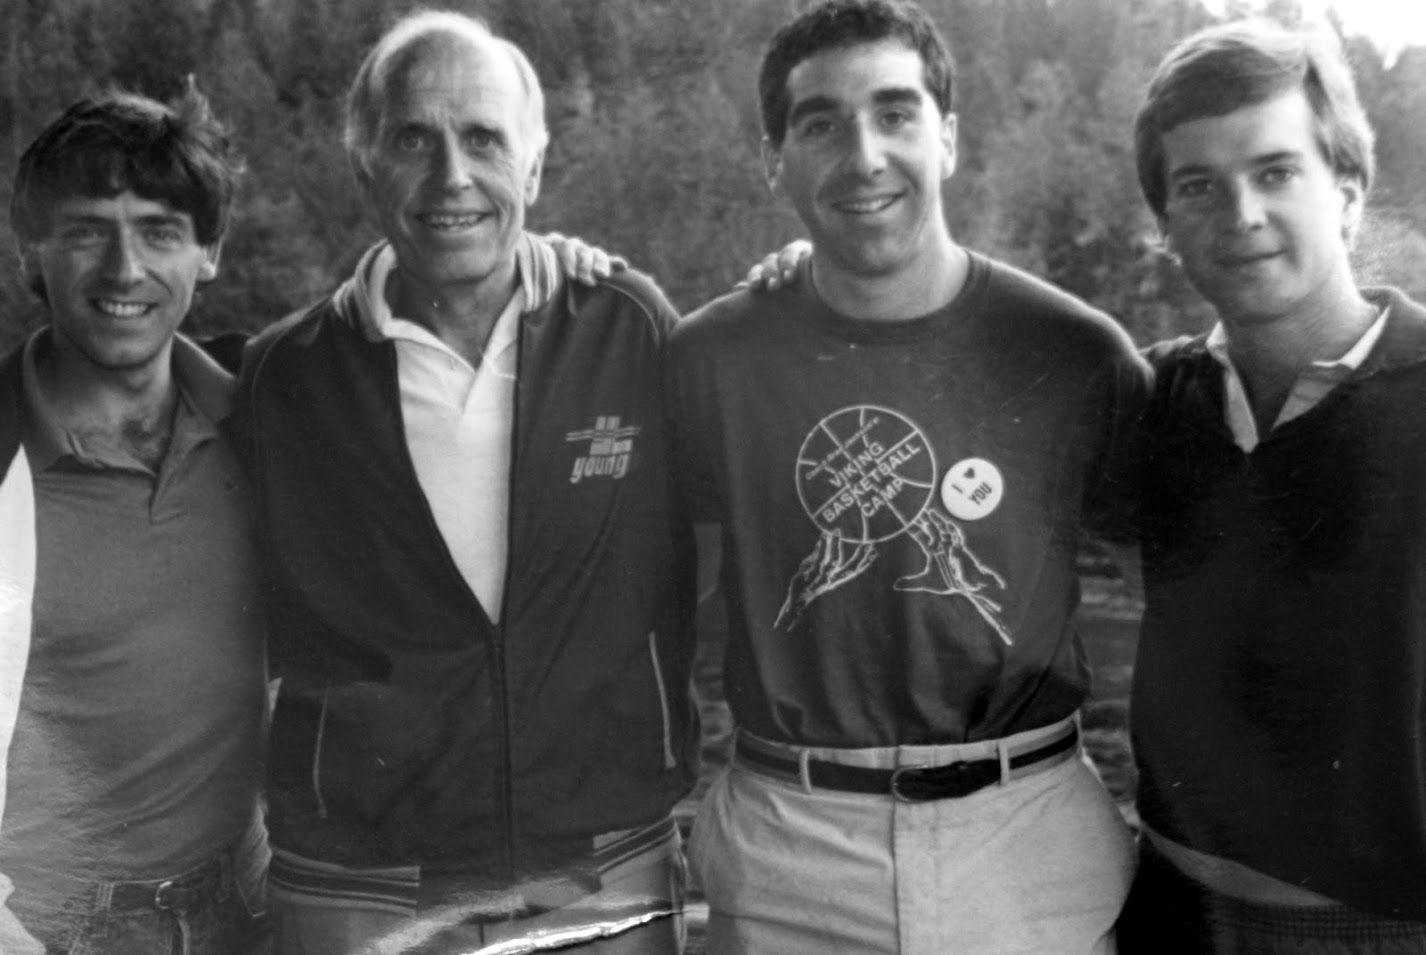 Malibu Club Program Staff (unknown date) left to right: Bill Maston, Bob Mitchell, Kevin Bryant, & John Franklin #younglife #malibuclub #ylMalibu #ylMalibuclub